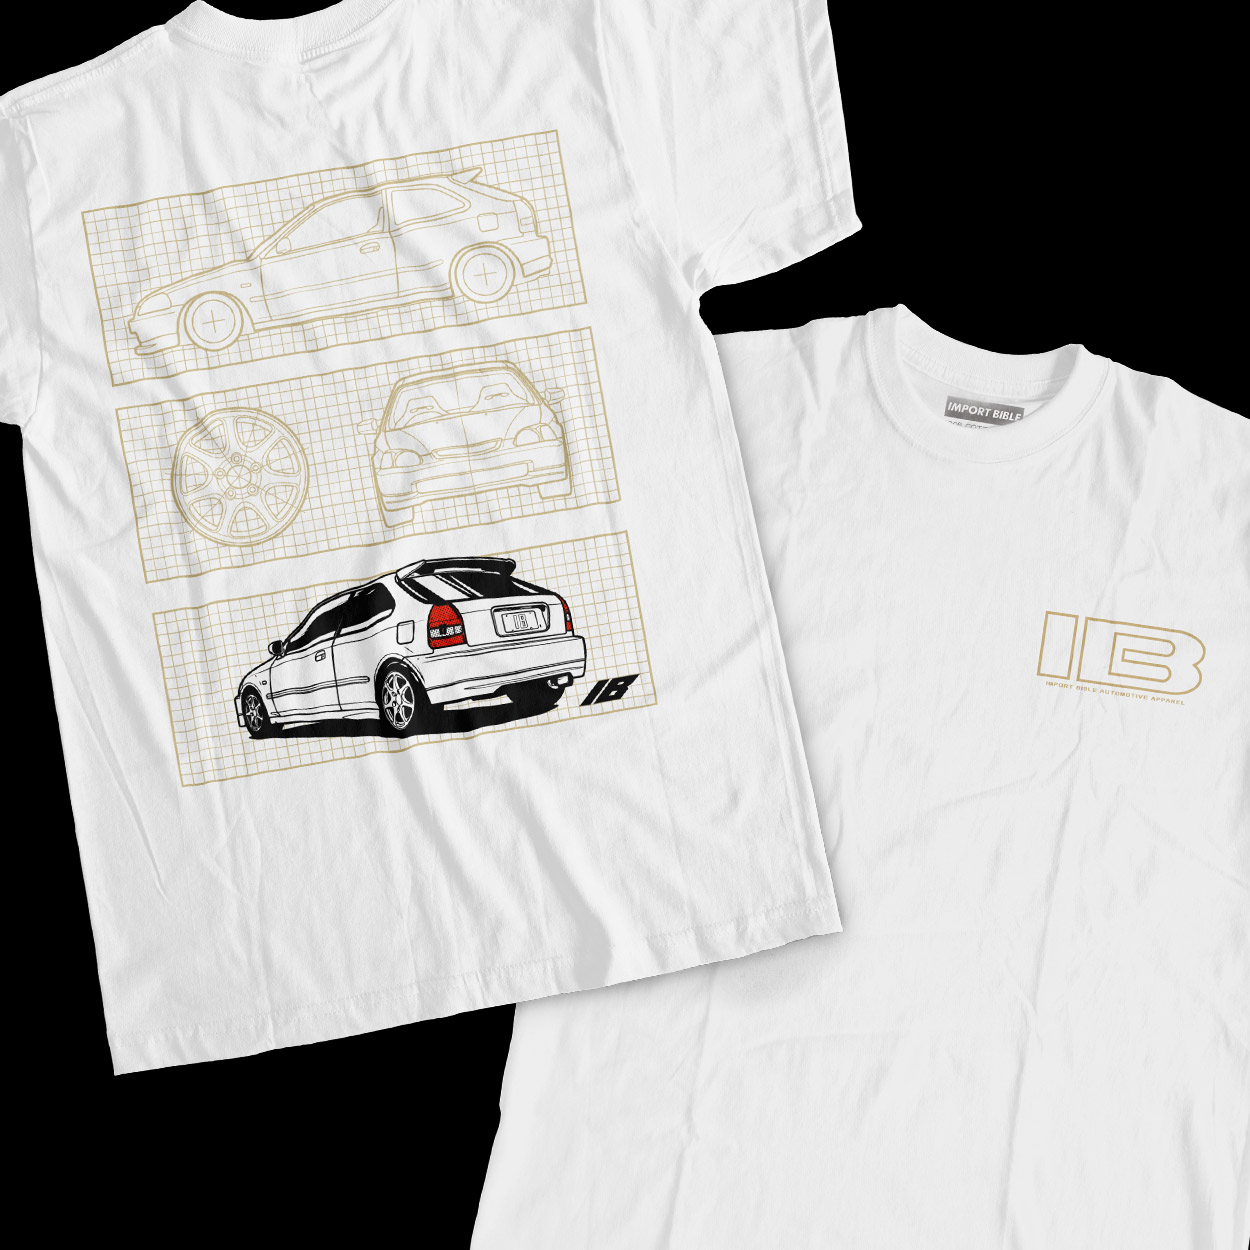 Blueprint (EK9) Shirt